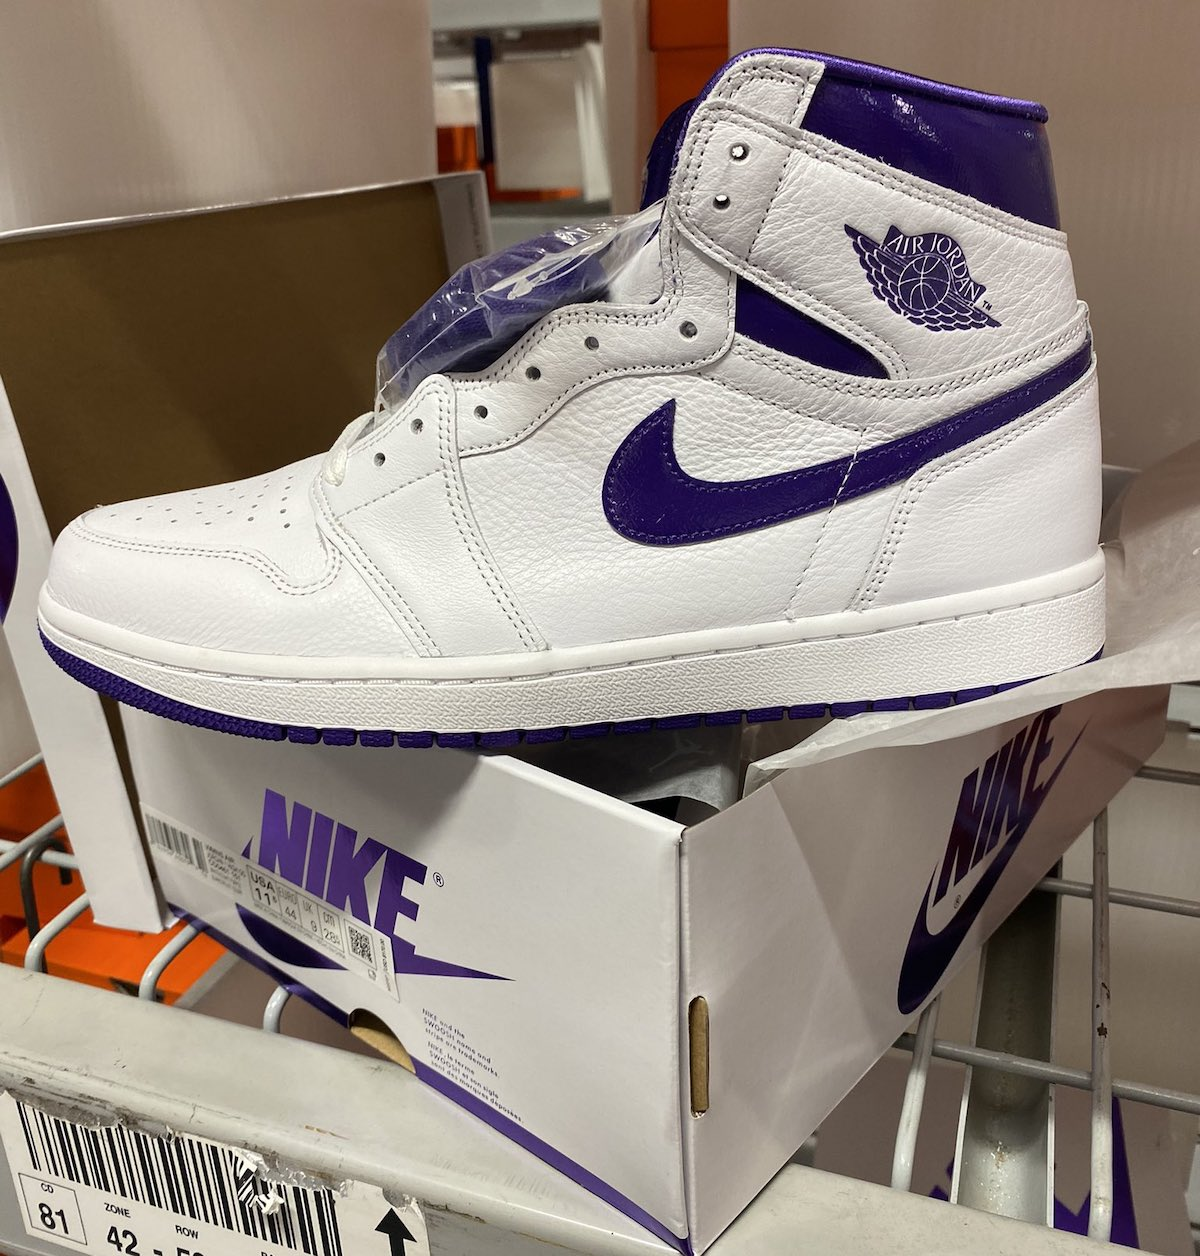 Air Jordan 1 Court Purple Release Date CD0461-151 Lateral Side